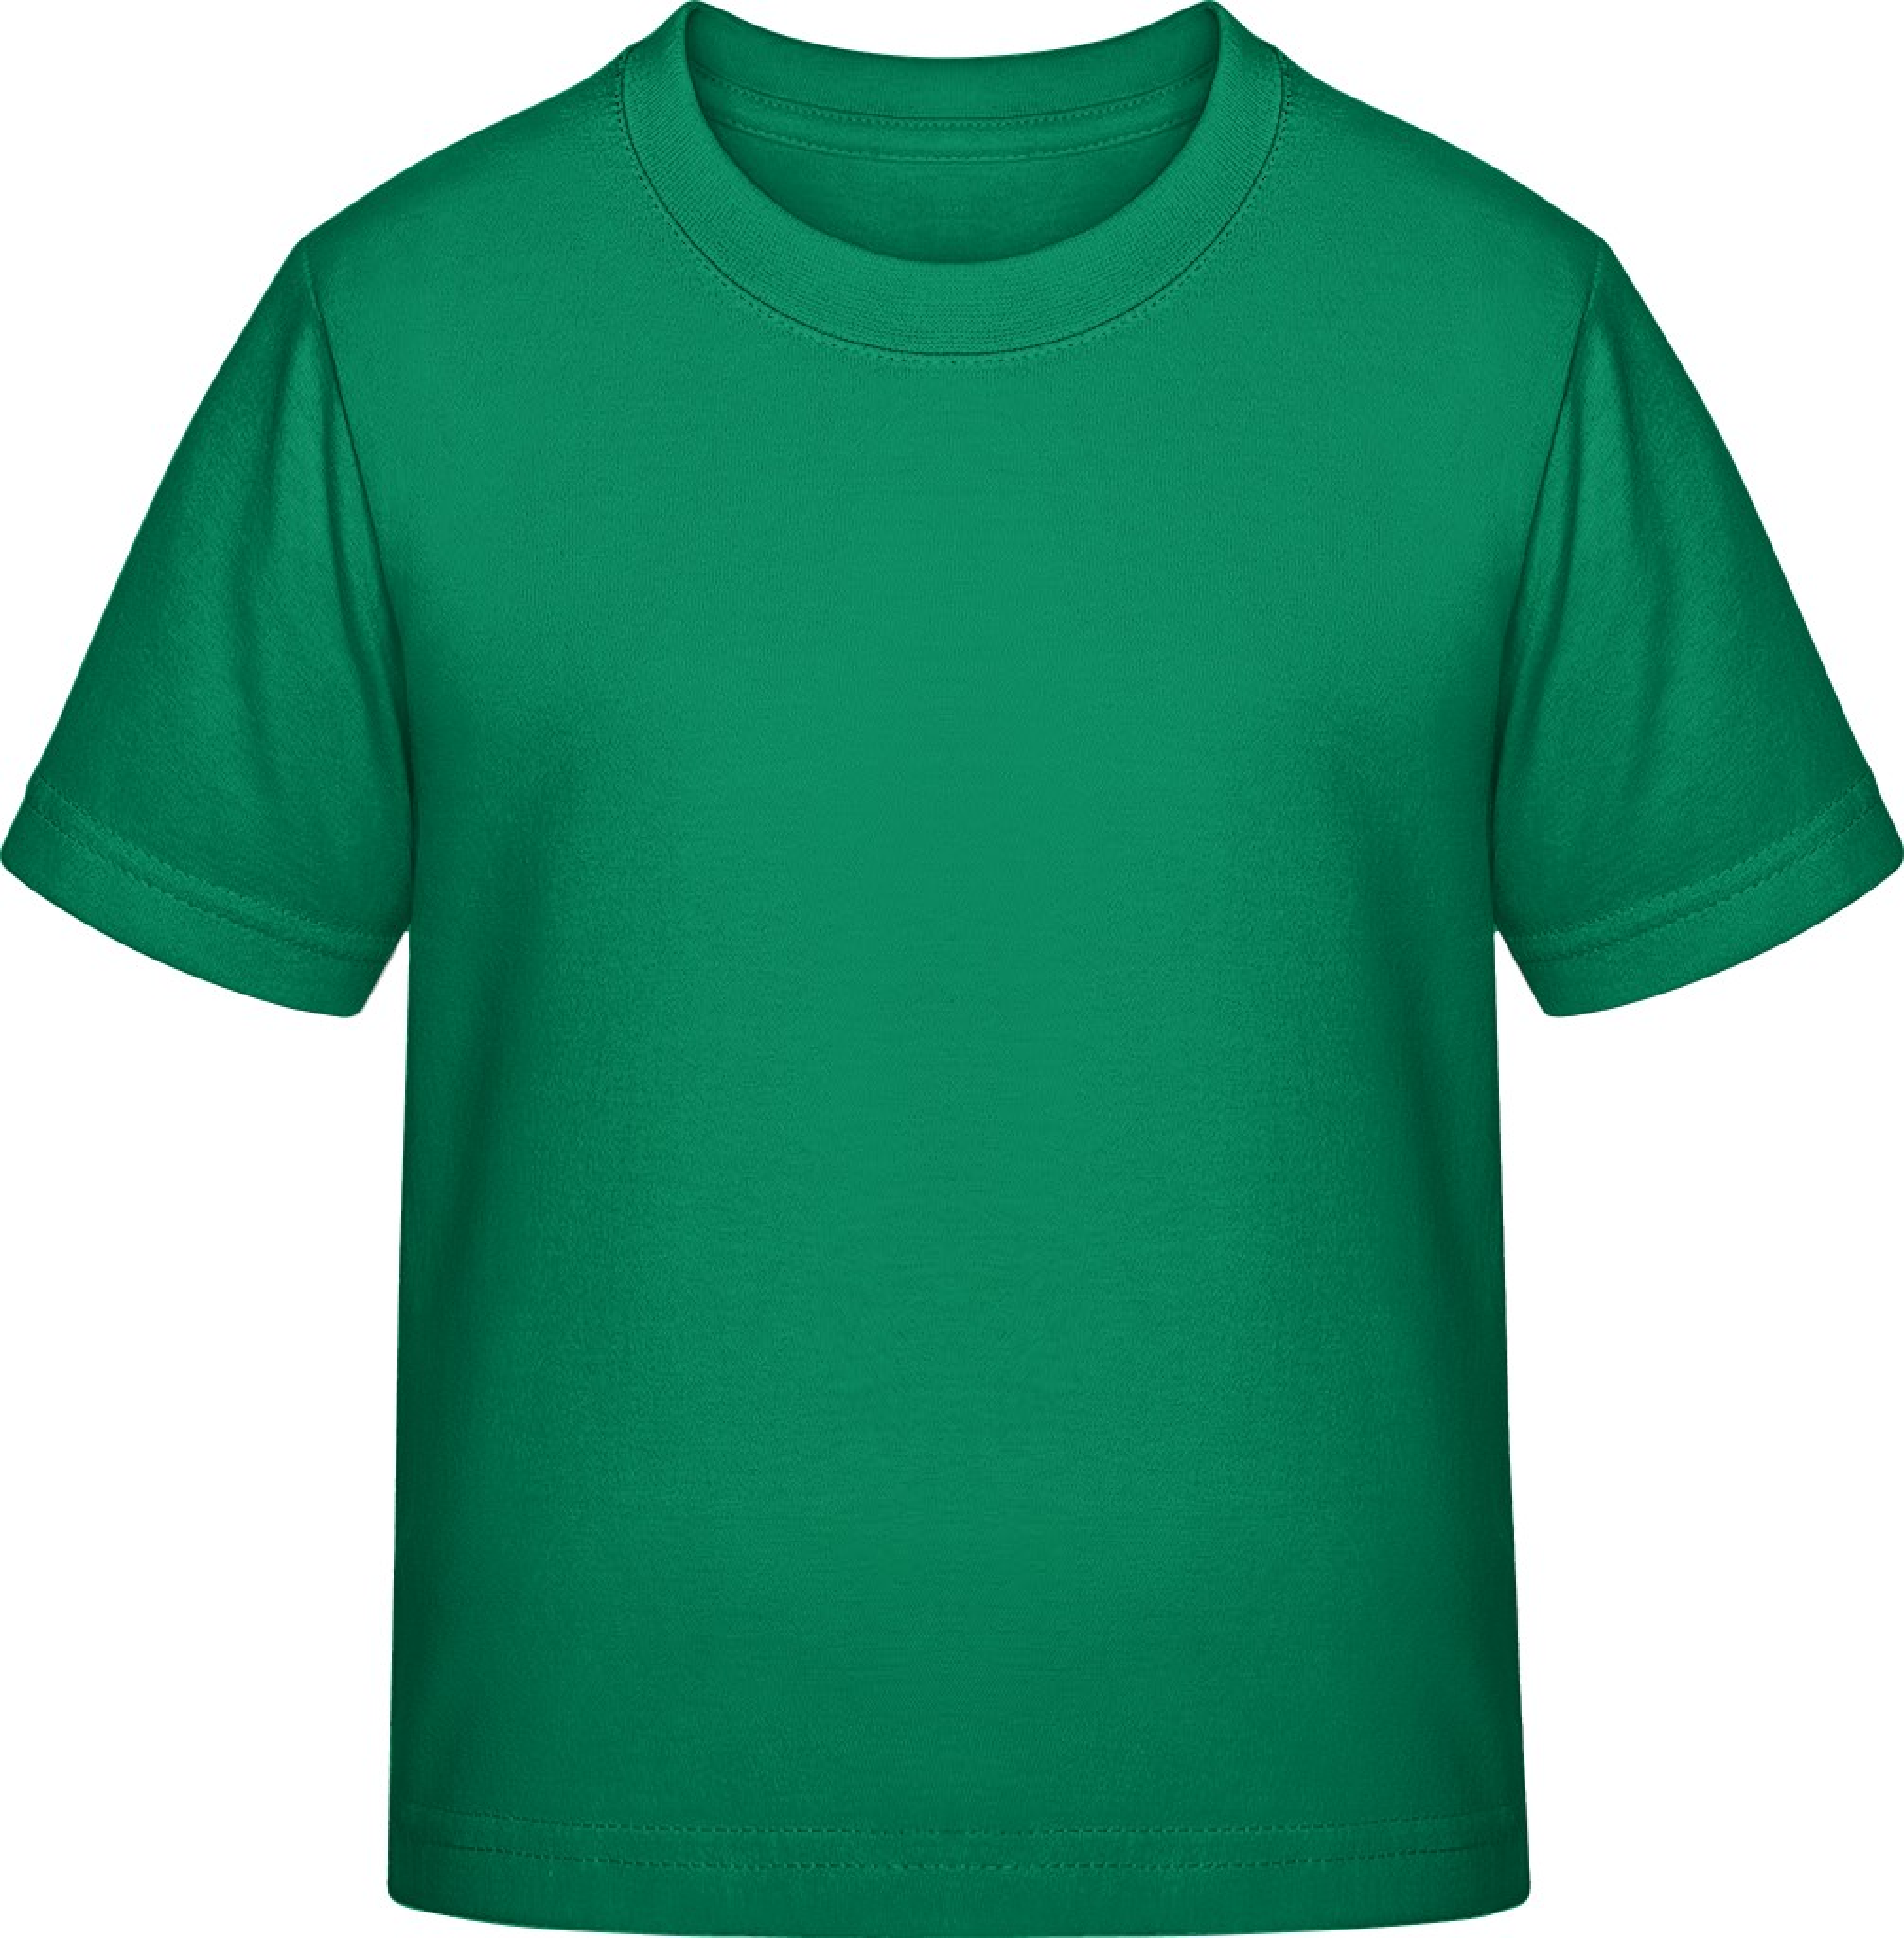 T Shirts Selber Gestalten Billig - Catalyst PSM